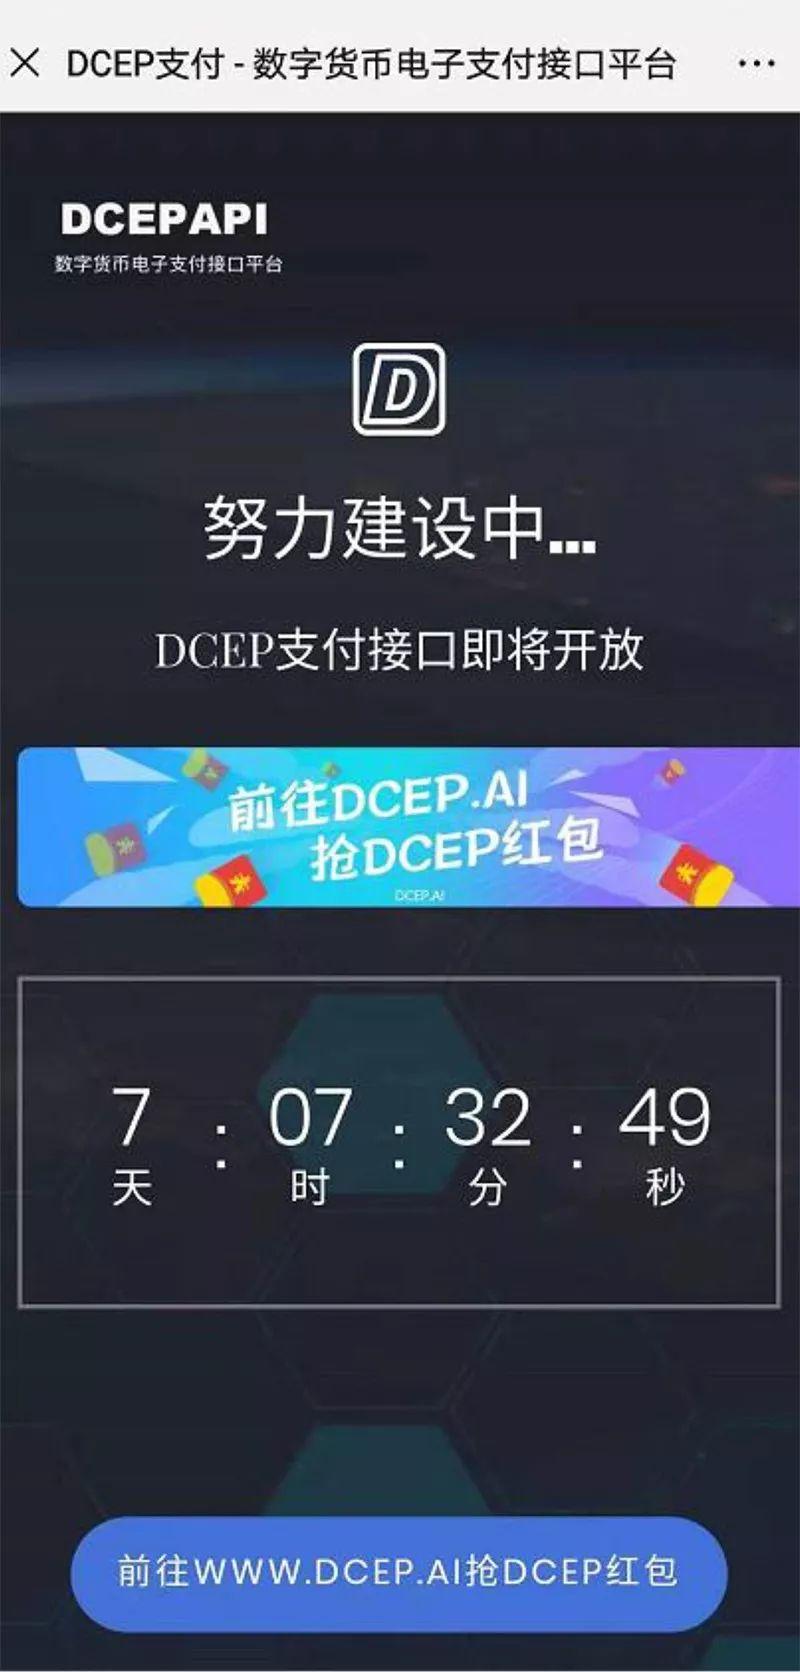 www.澳门威尼斯娱乐,三星确认正研发真正的全面屏 帮助去掉iPhone的刘海